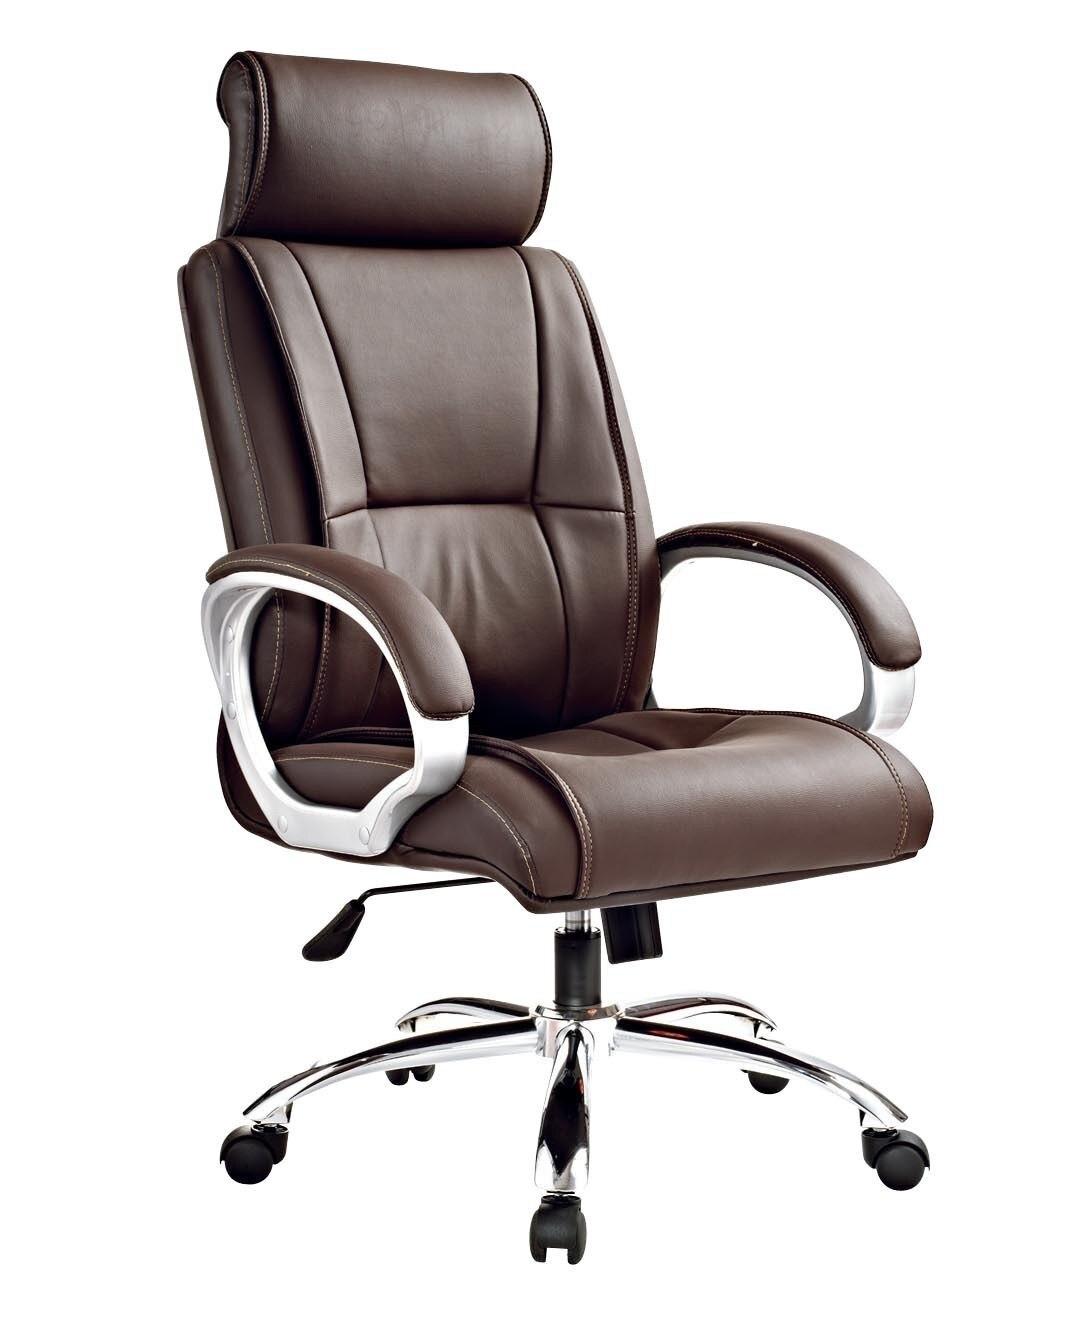 European Xiang Jin Furniture Can Happy Swivel Ergonomic Home Computer To Work In An Office Chair